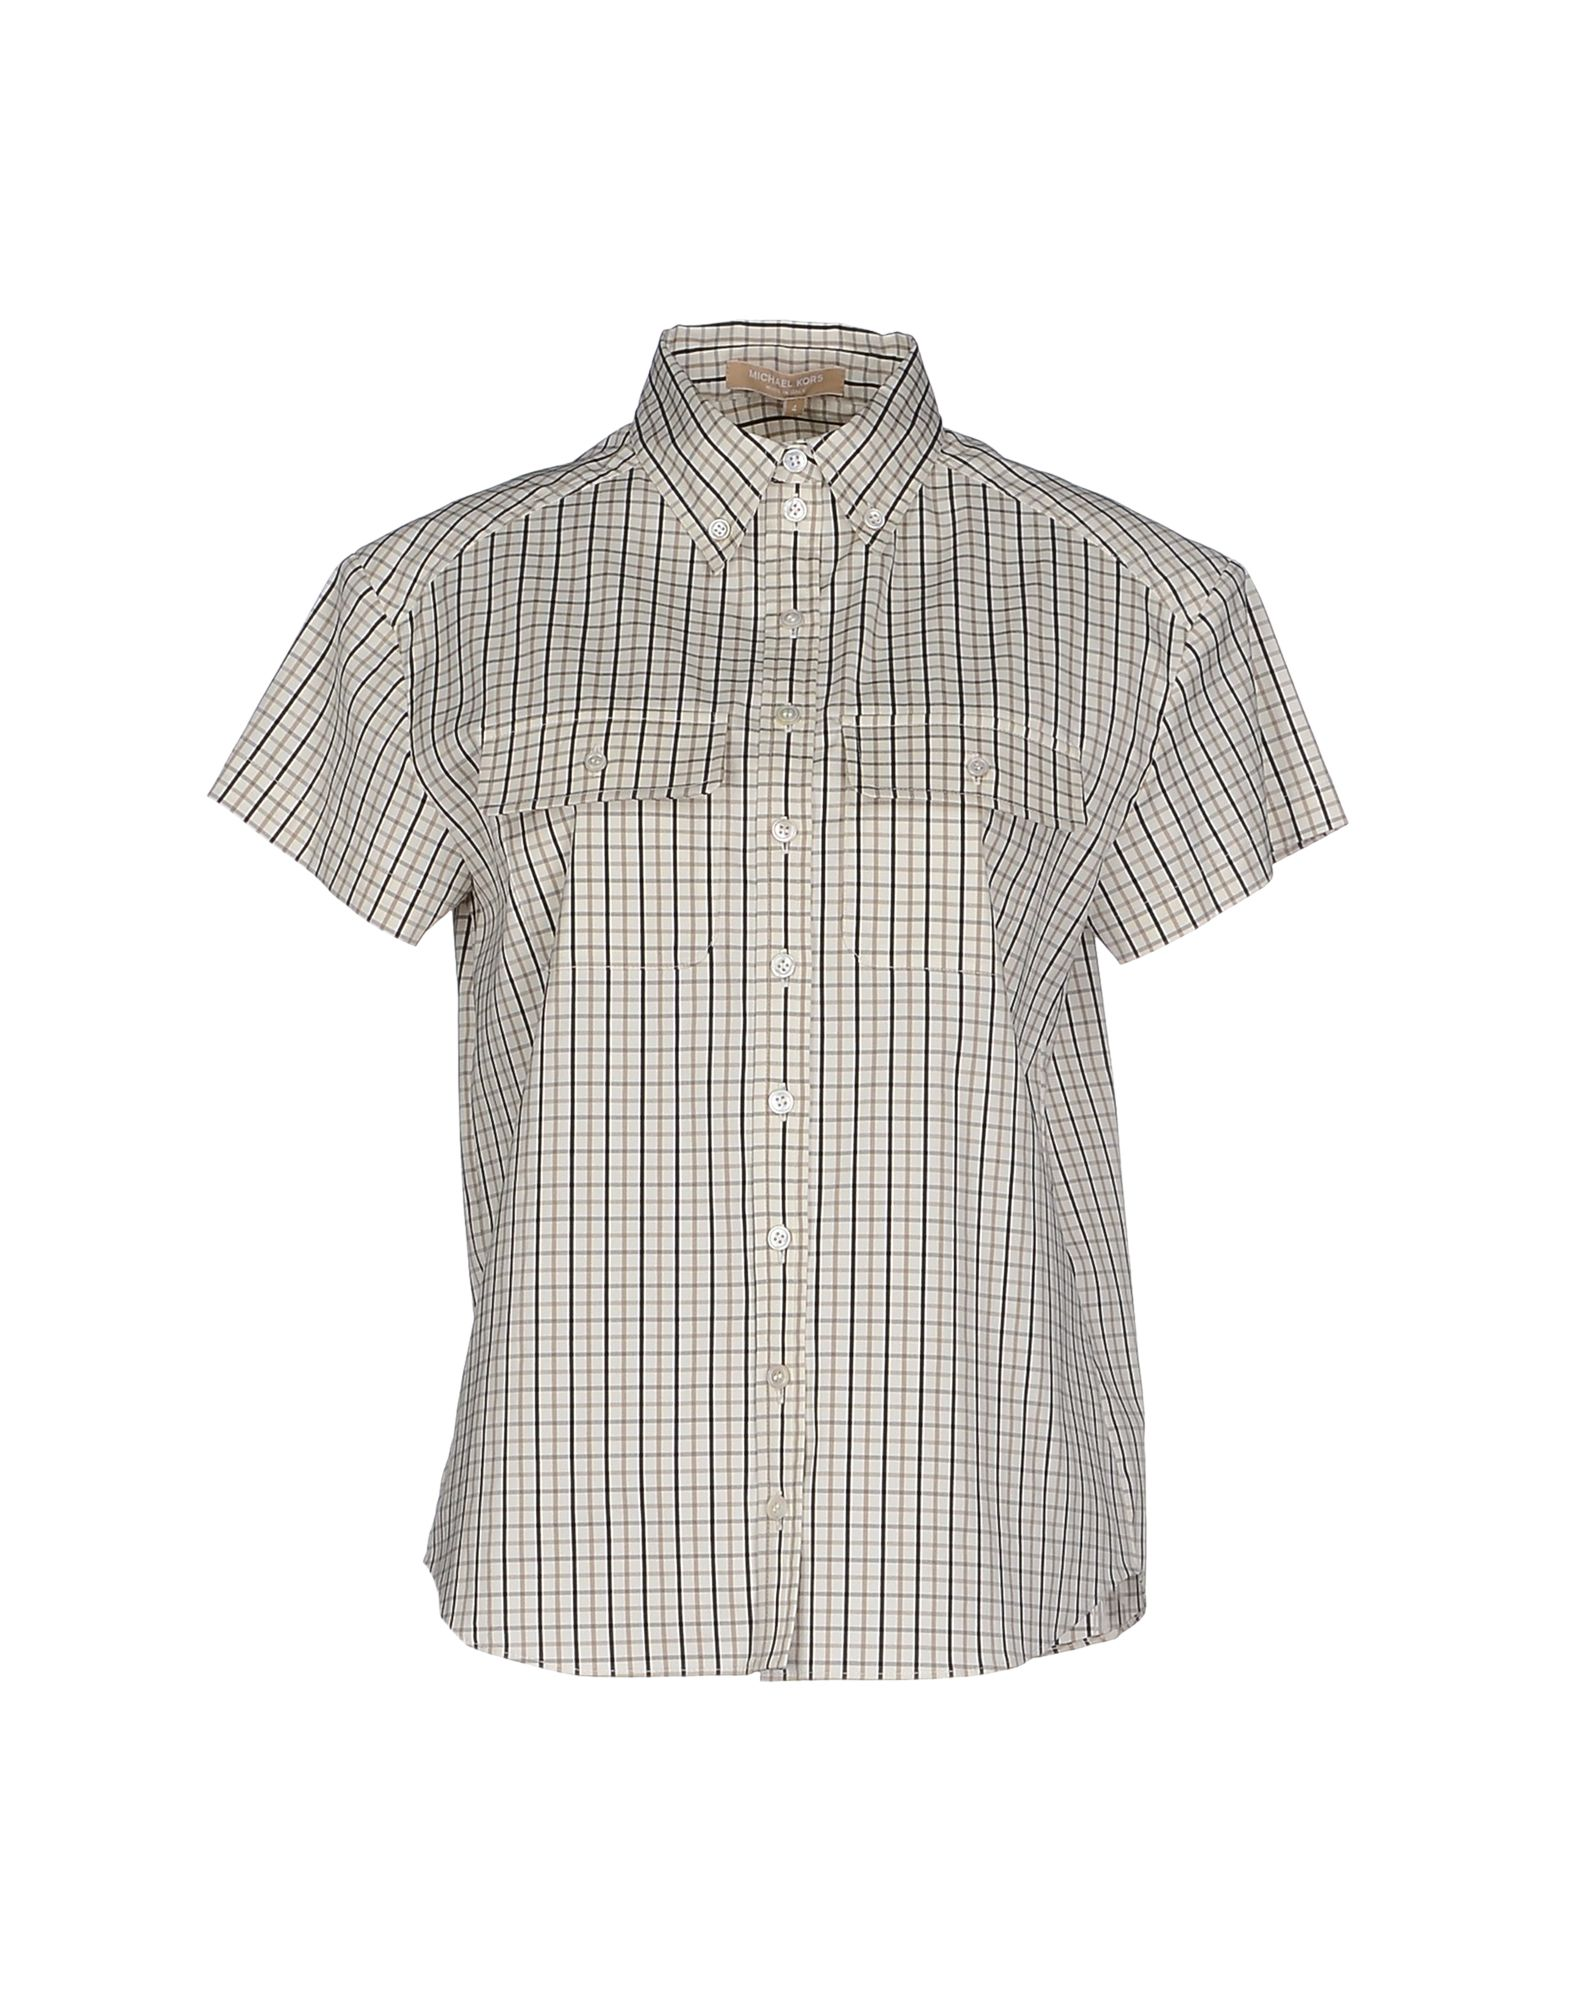 michael kors female michael kors shirts